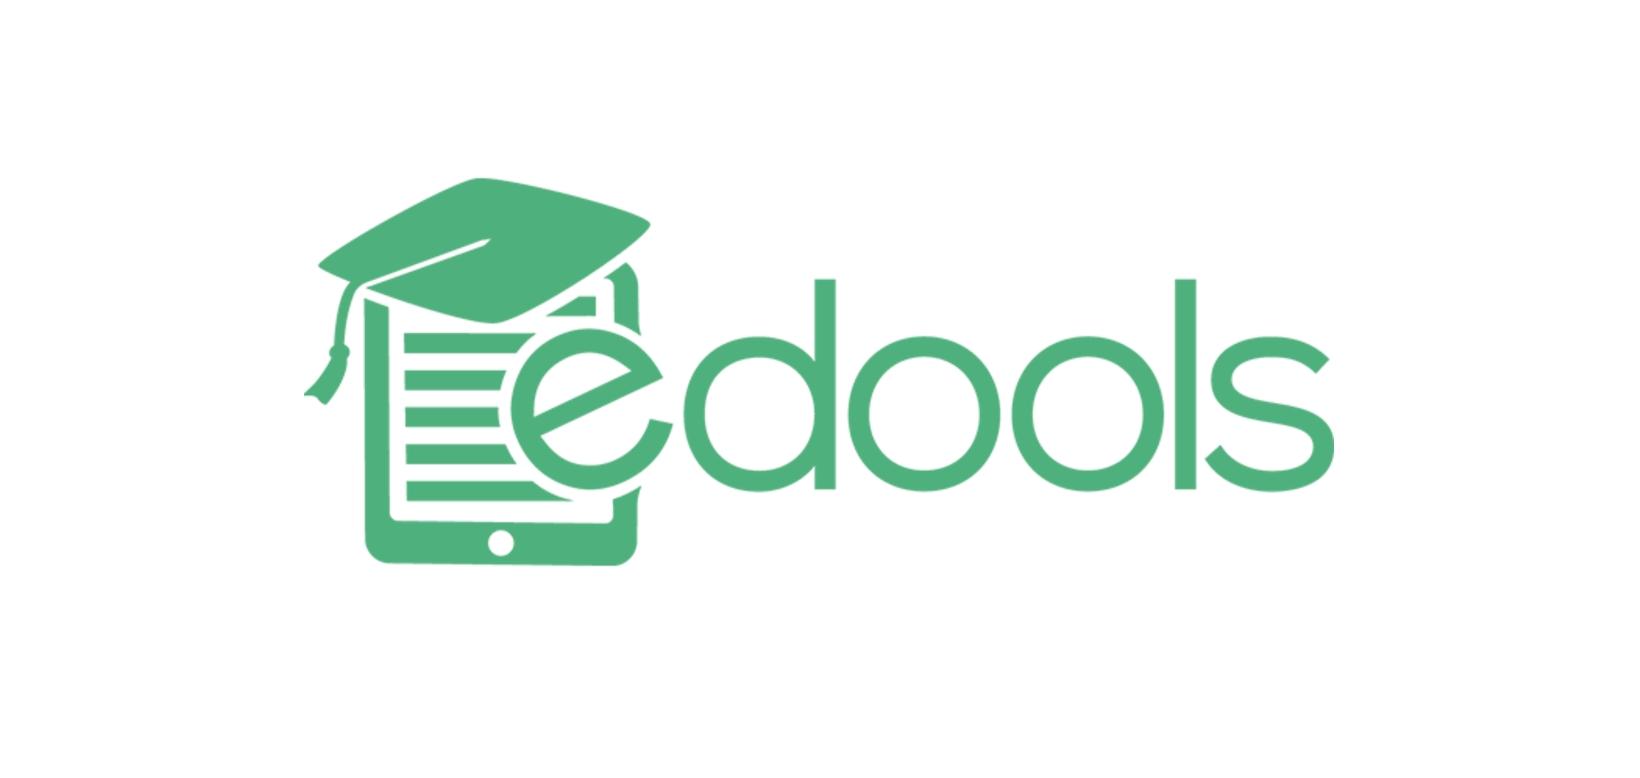 Edools-oferece-tecnologia-para-20181217142642.jpg